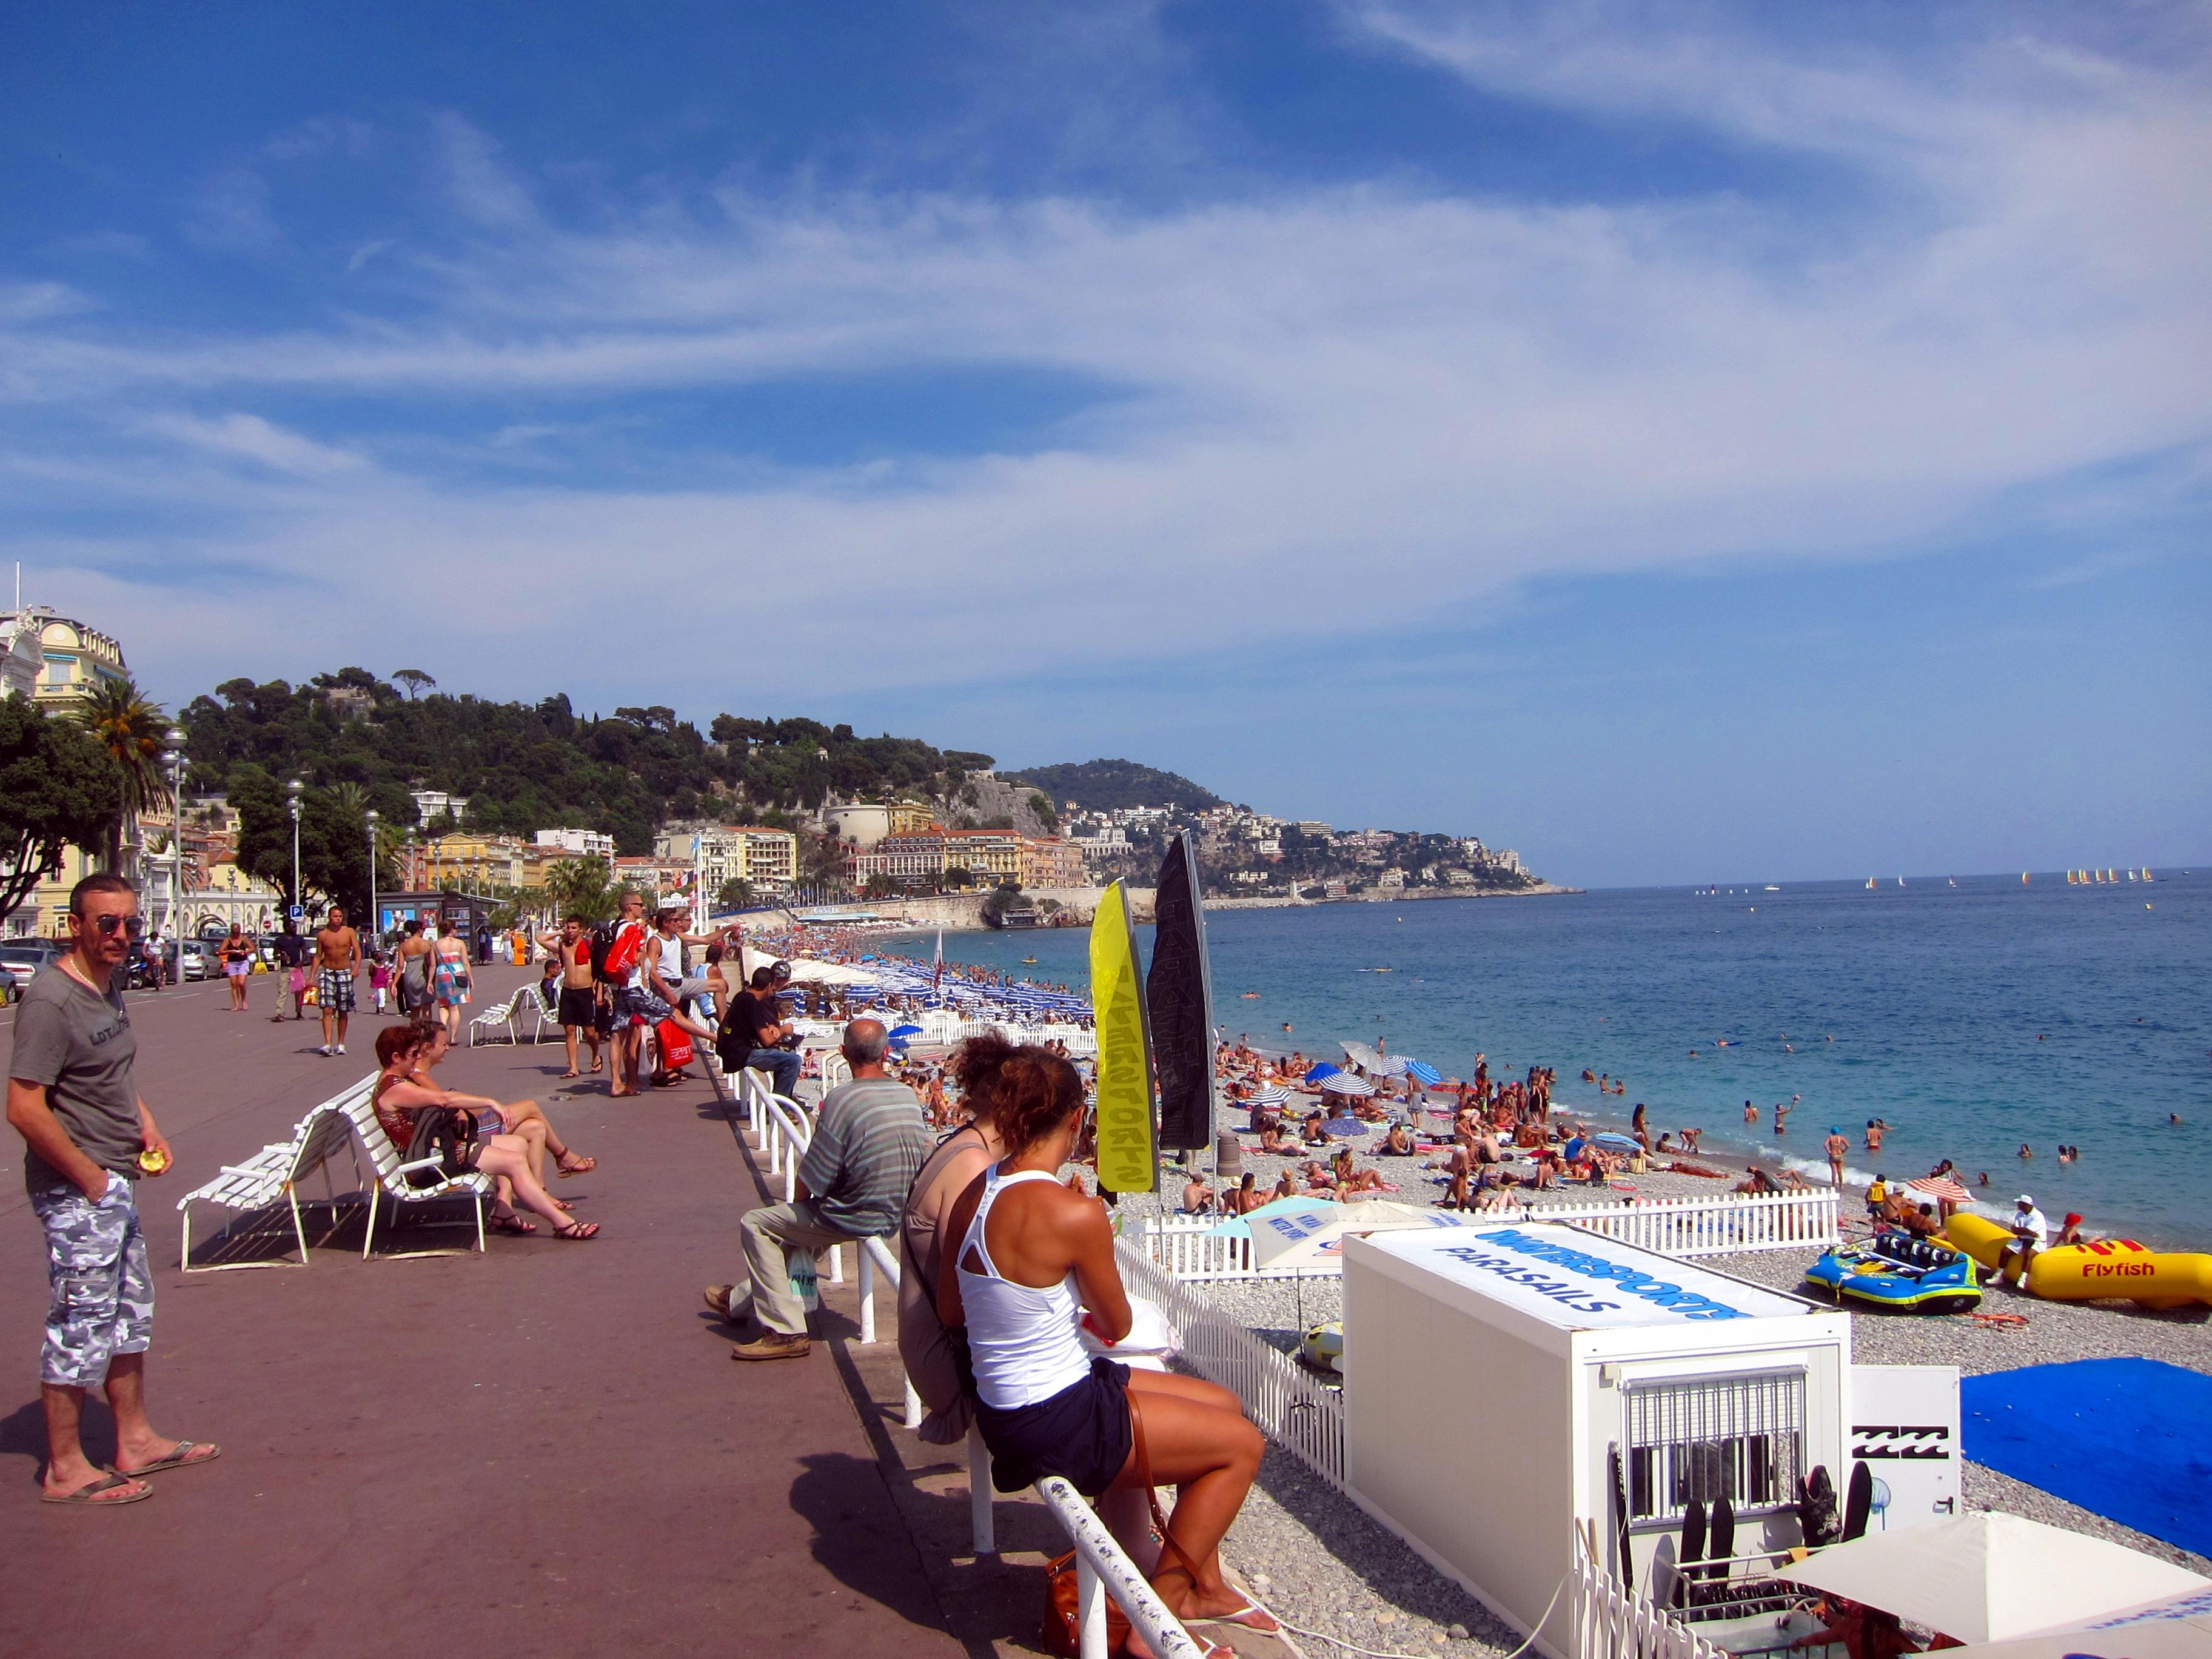 Promenade_des_Anglais_in_Nice